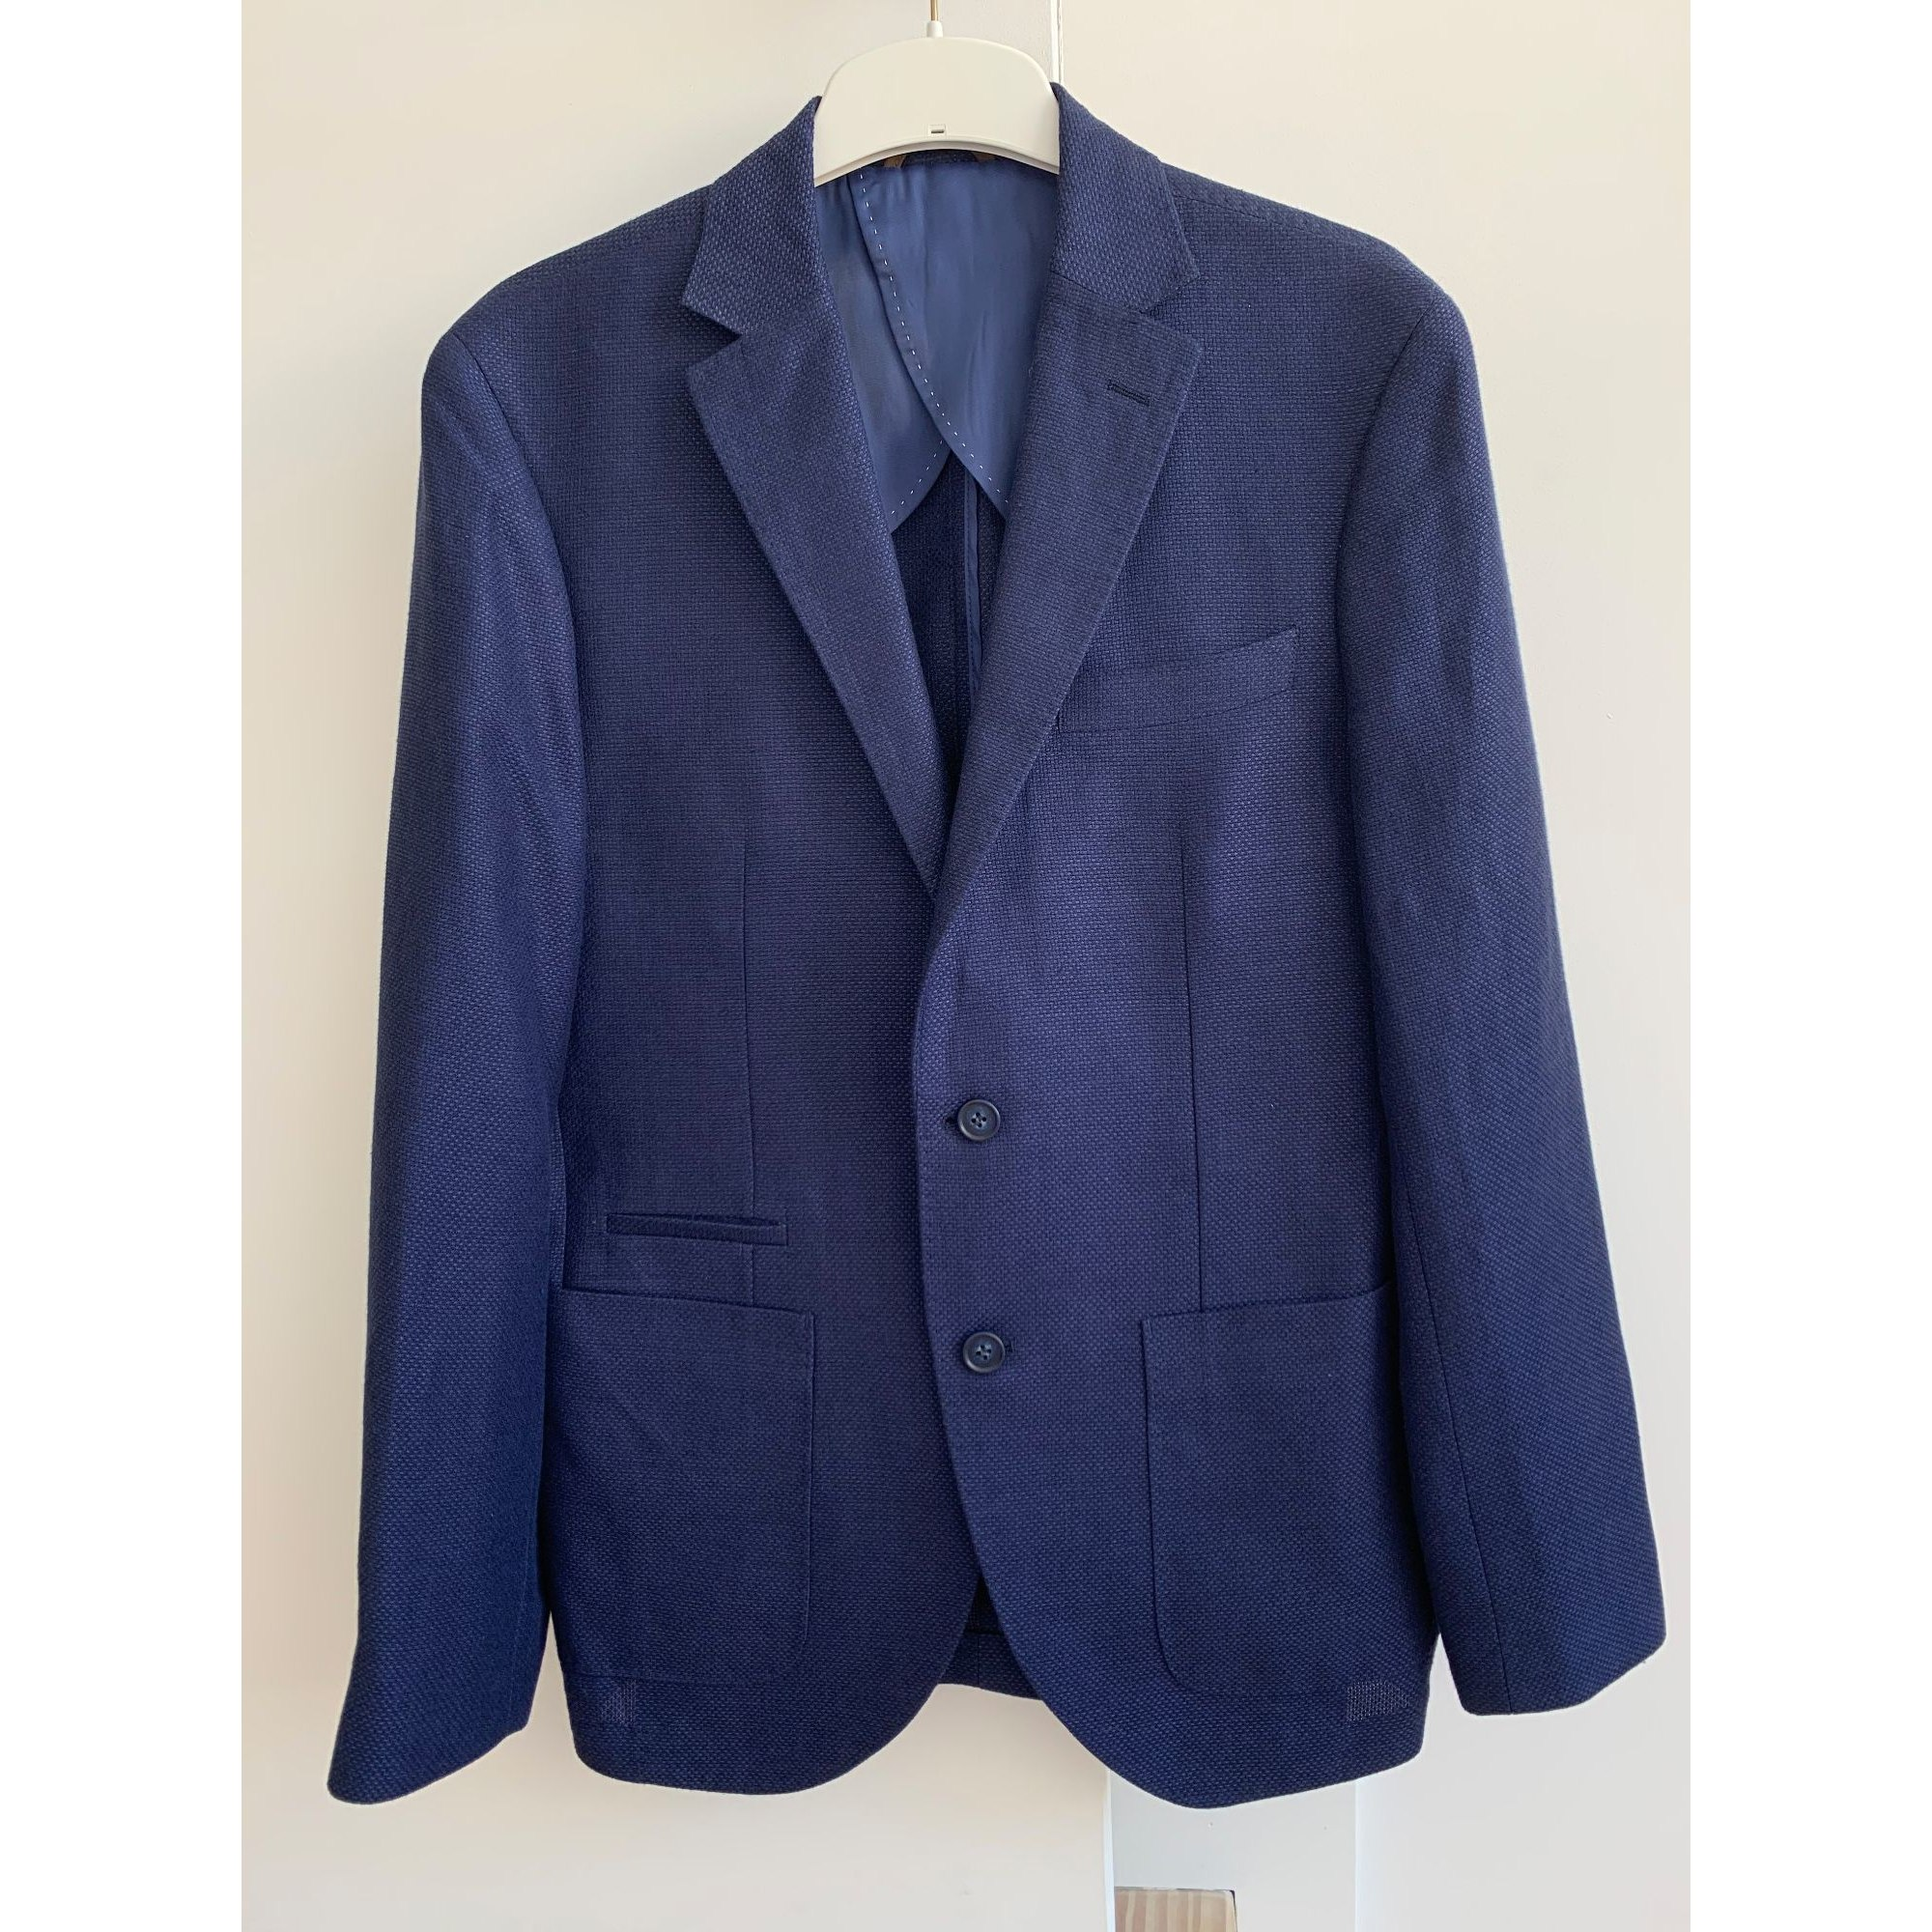 Veste B GARBO Bleu, bleu marine, bleu turquoise